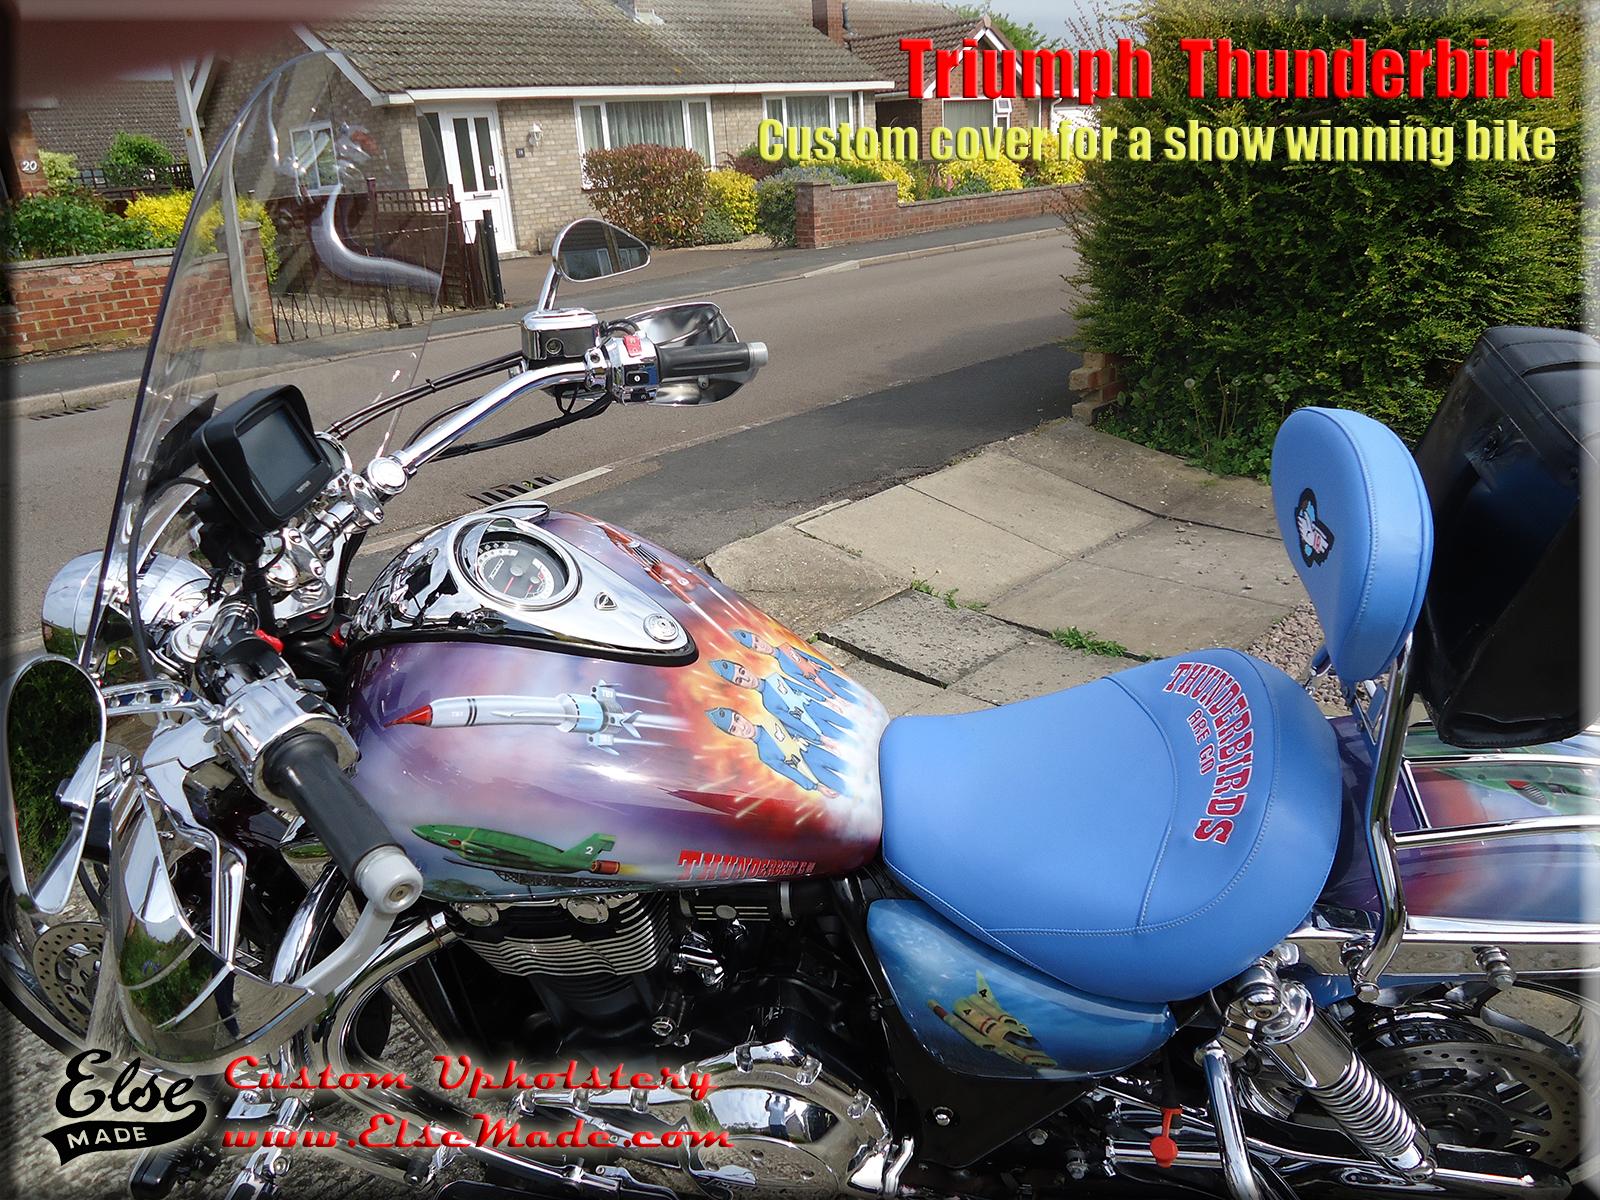 thunderbird on bike 2.jpg